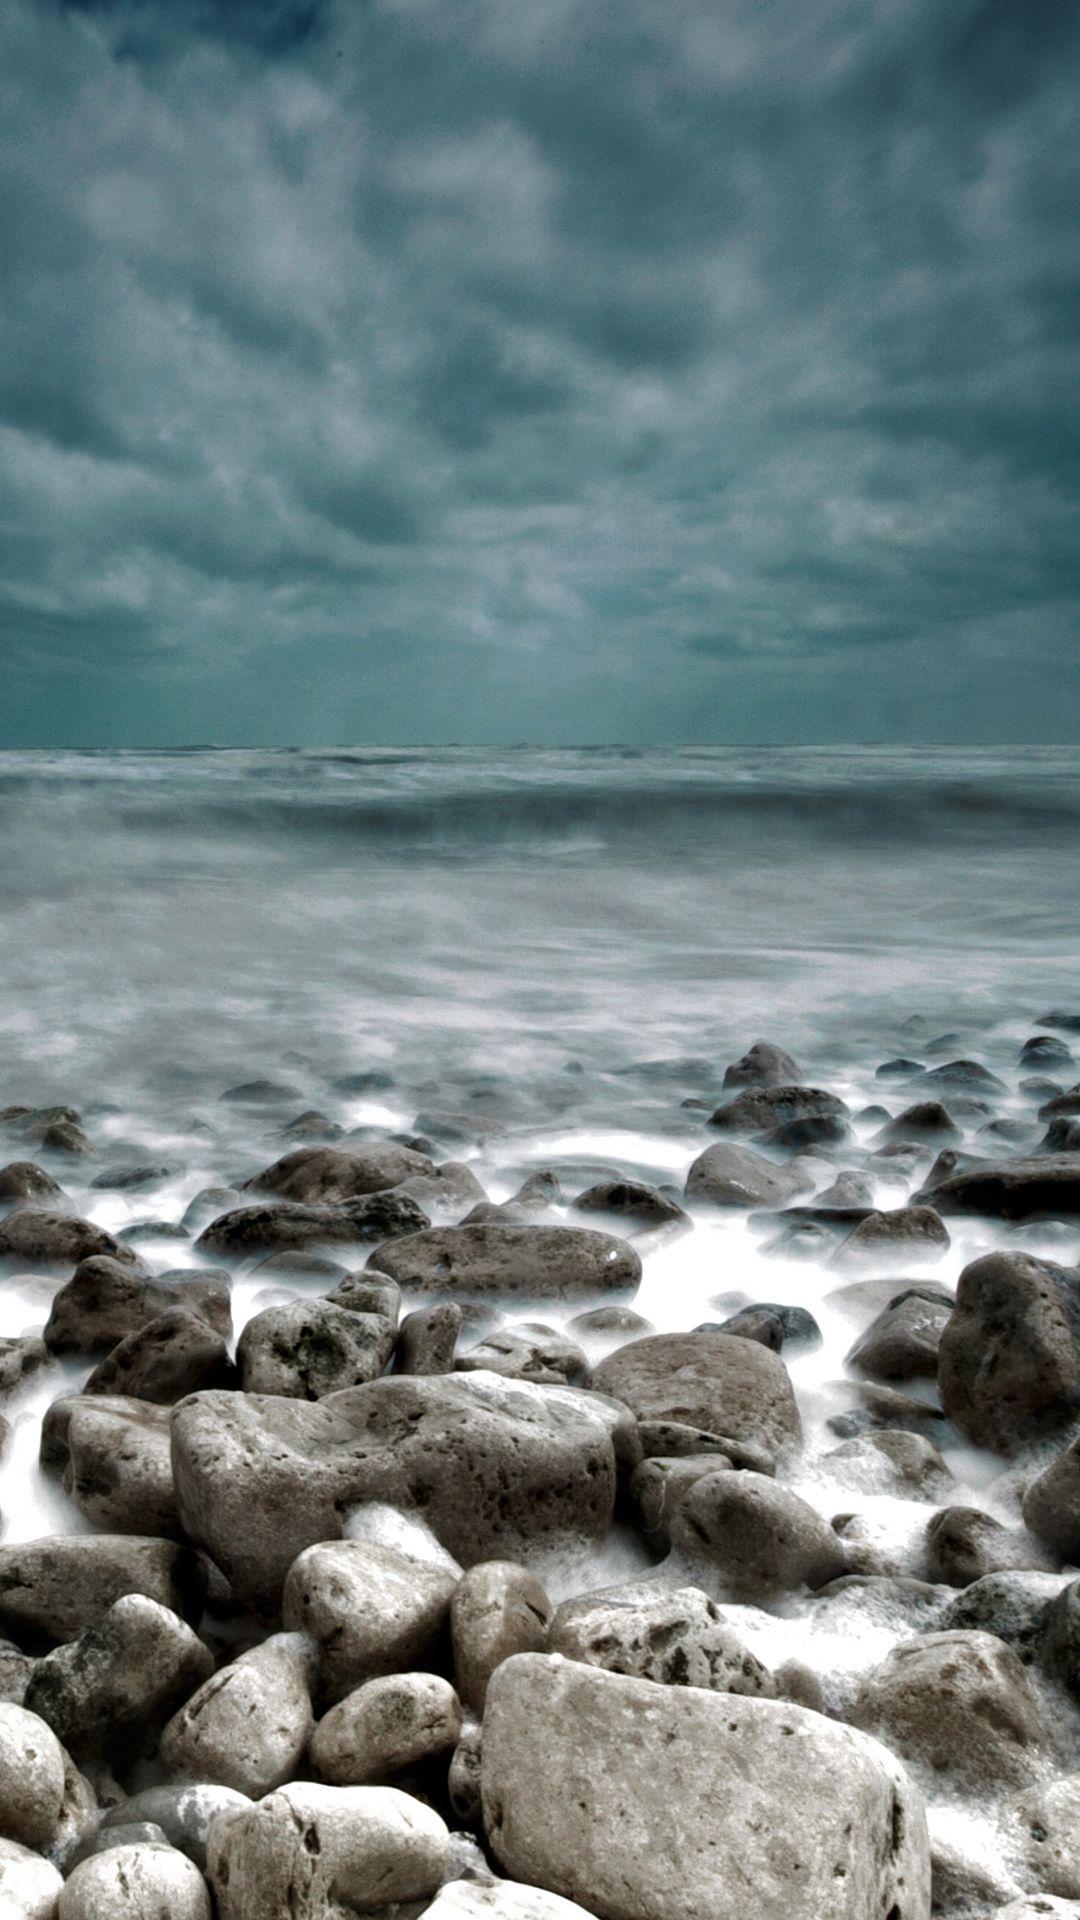 Rough Sea Rocks Waves Lockscreen iPhone 6 Plus HD Wallpaper